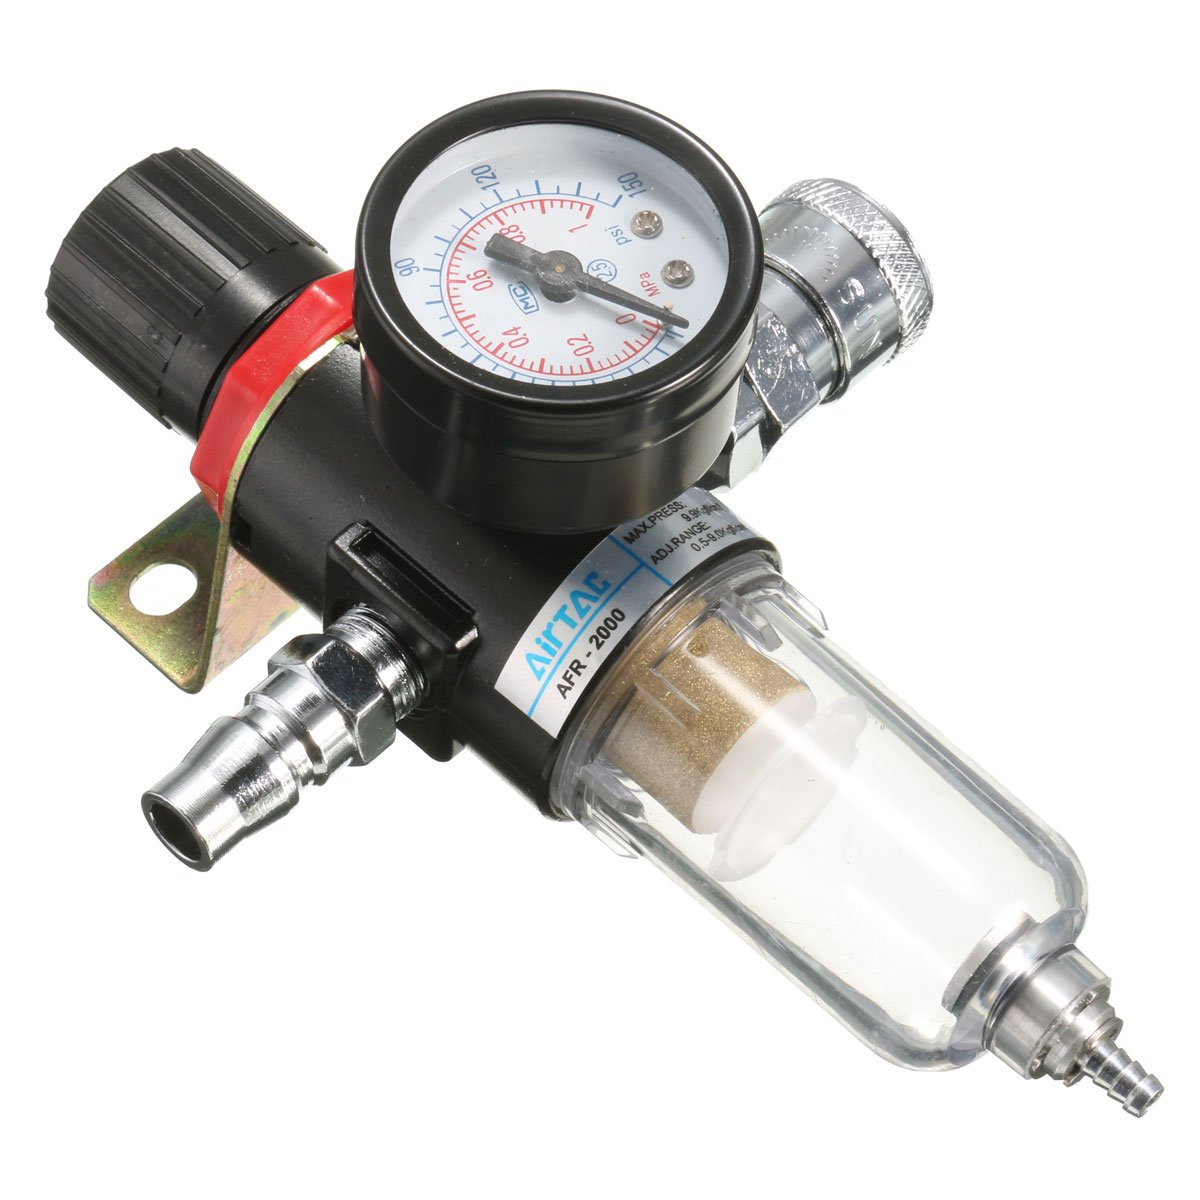 QOJA afr-2000 1/4'' air compressor filter water separator trap by QOJA (Image #4)